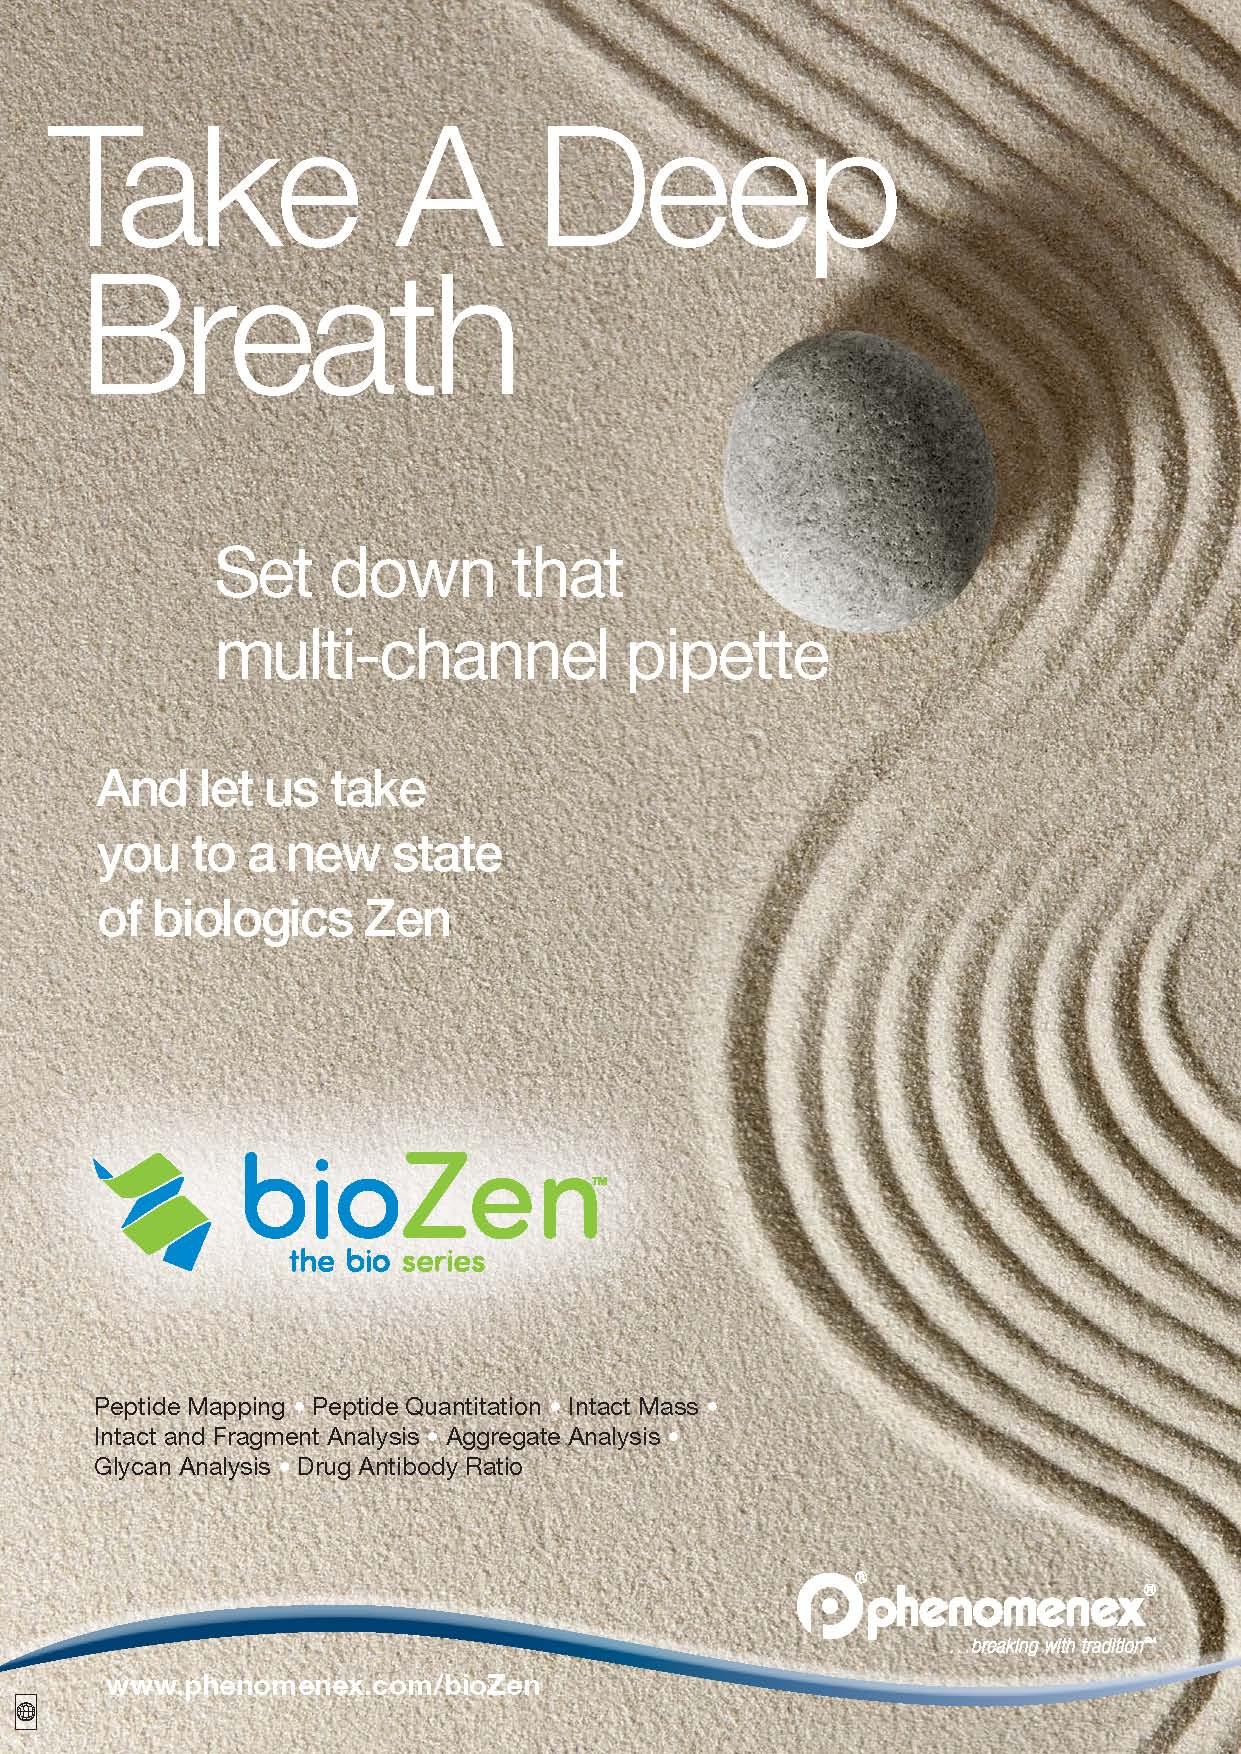 bioZen Brochure_2018